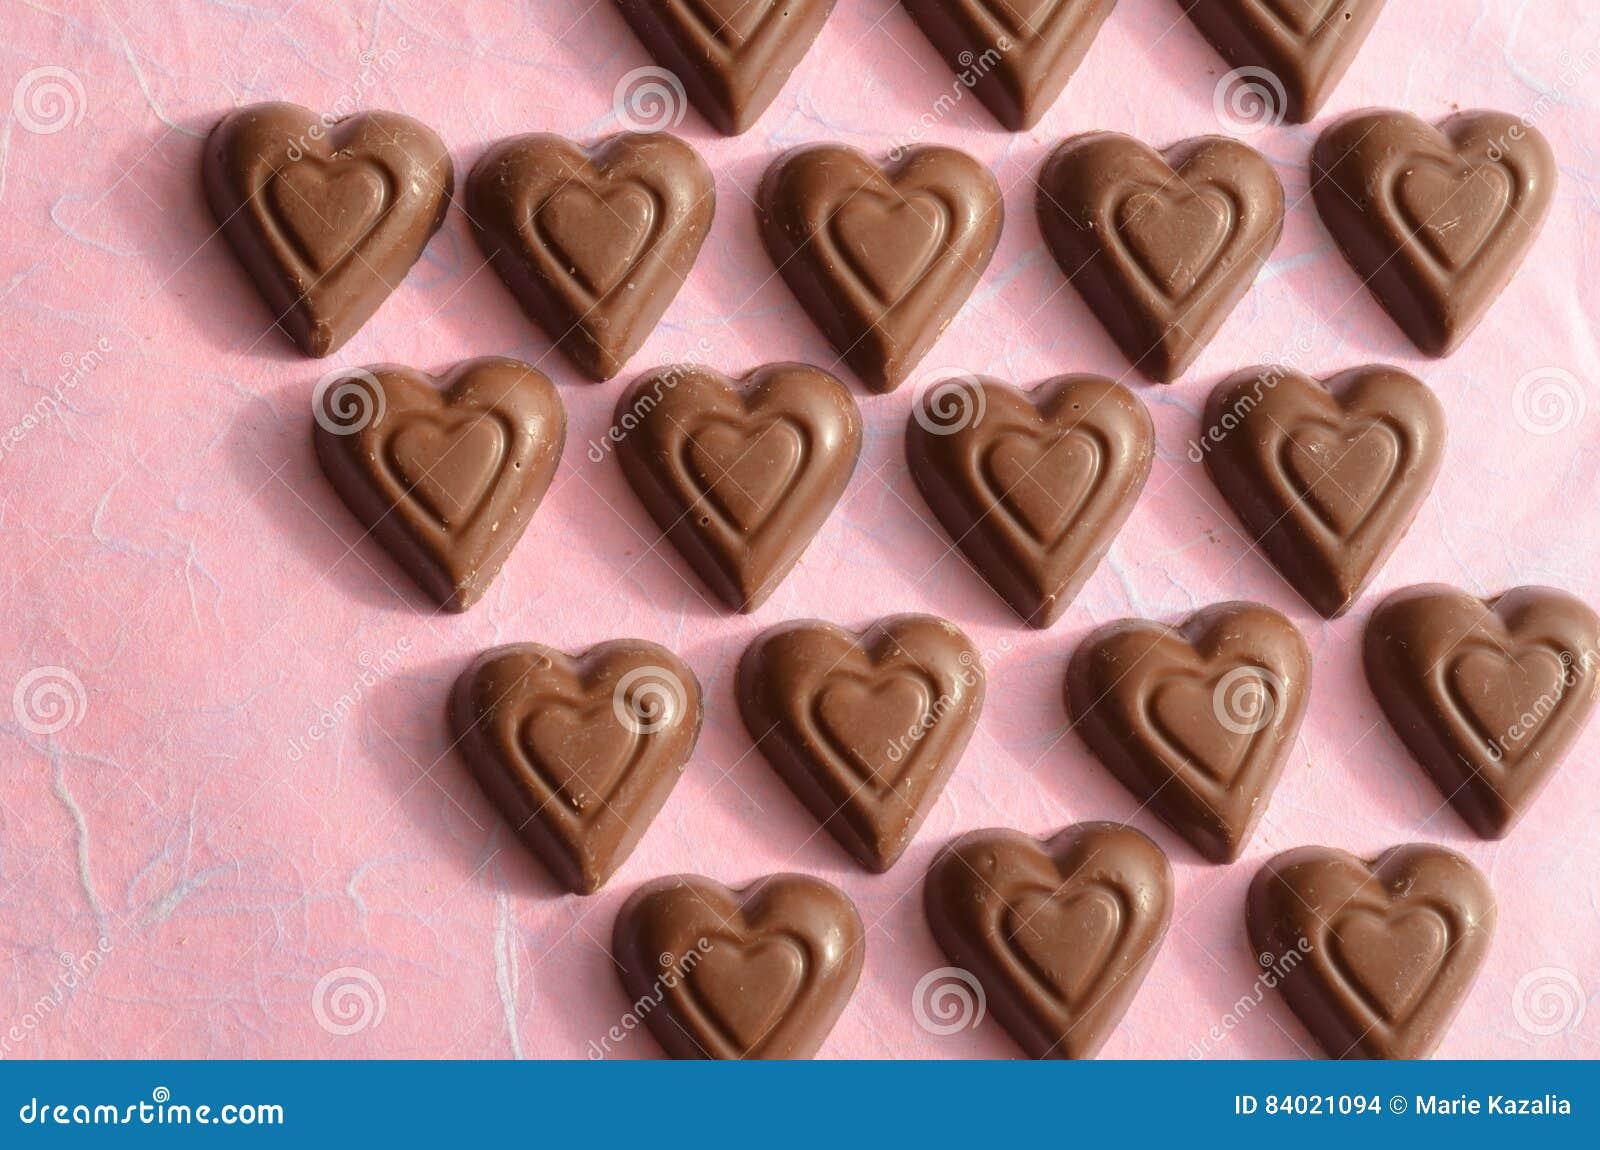 Heart Shape Chocolate Valentines Day Symbols Of Love Stock Photo